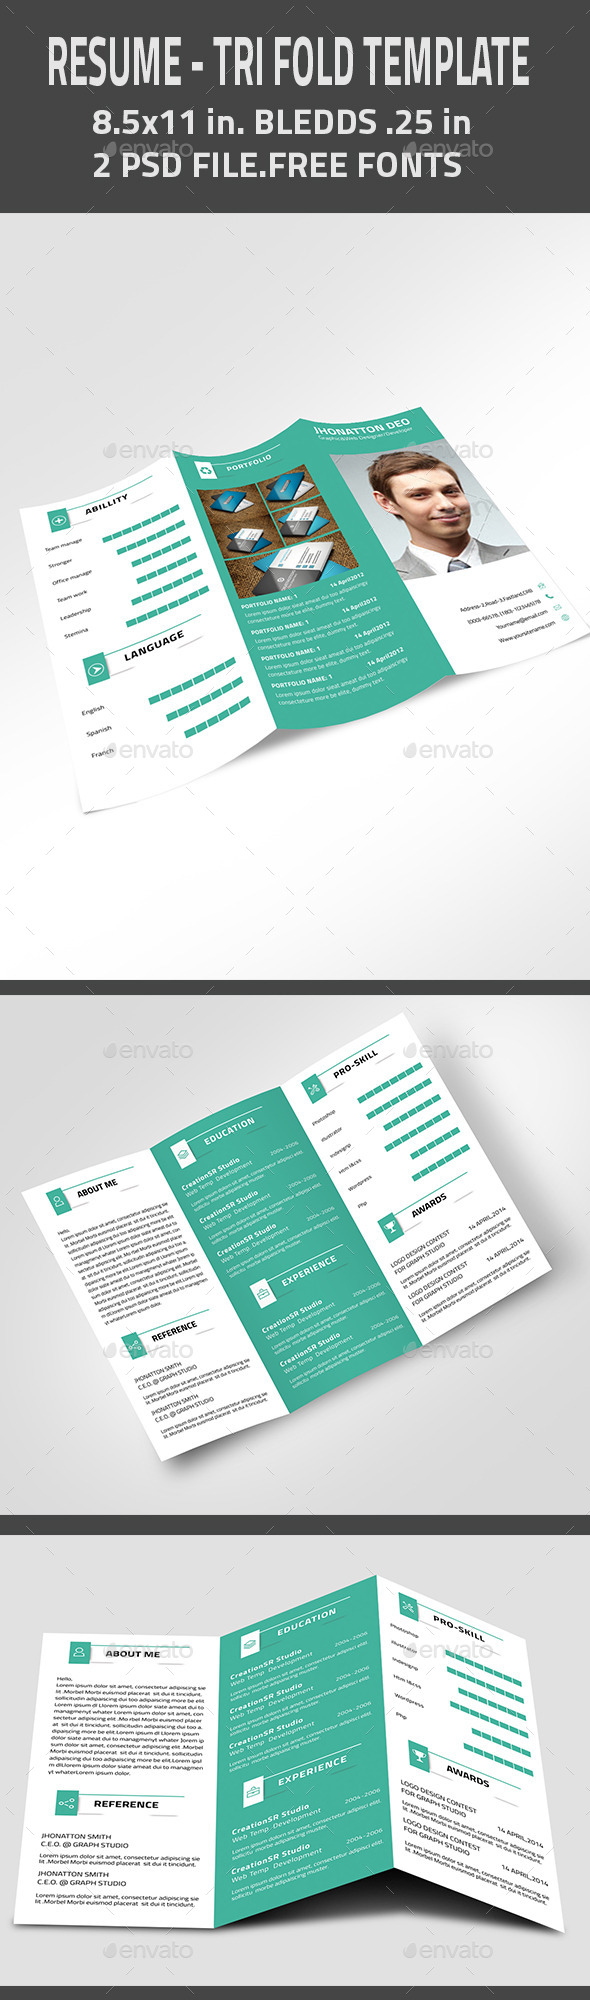 resume tri fold  u00bb tinkytyler org